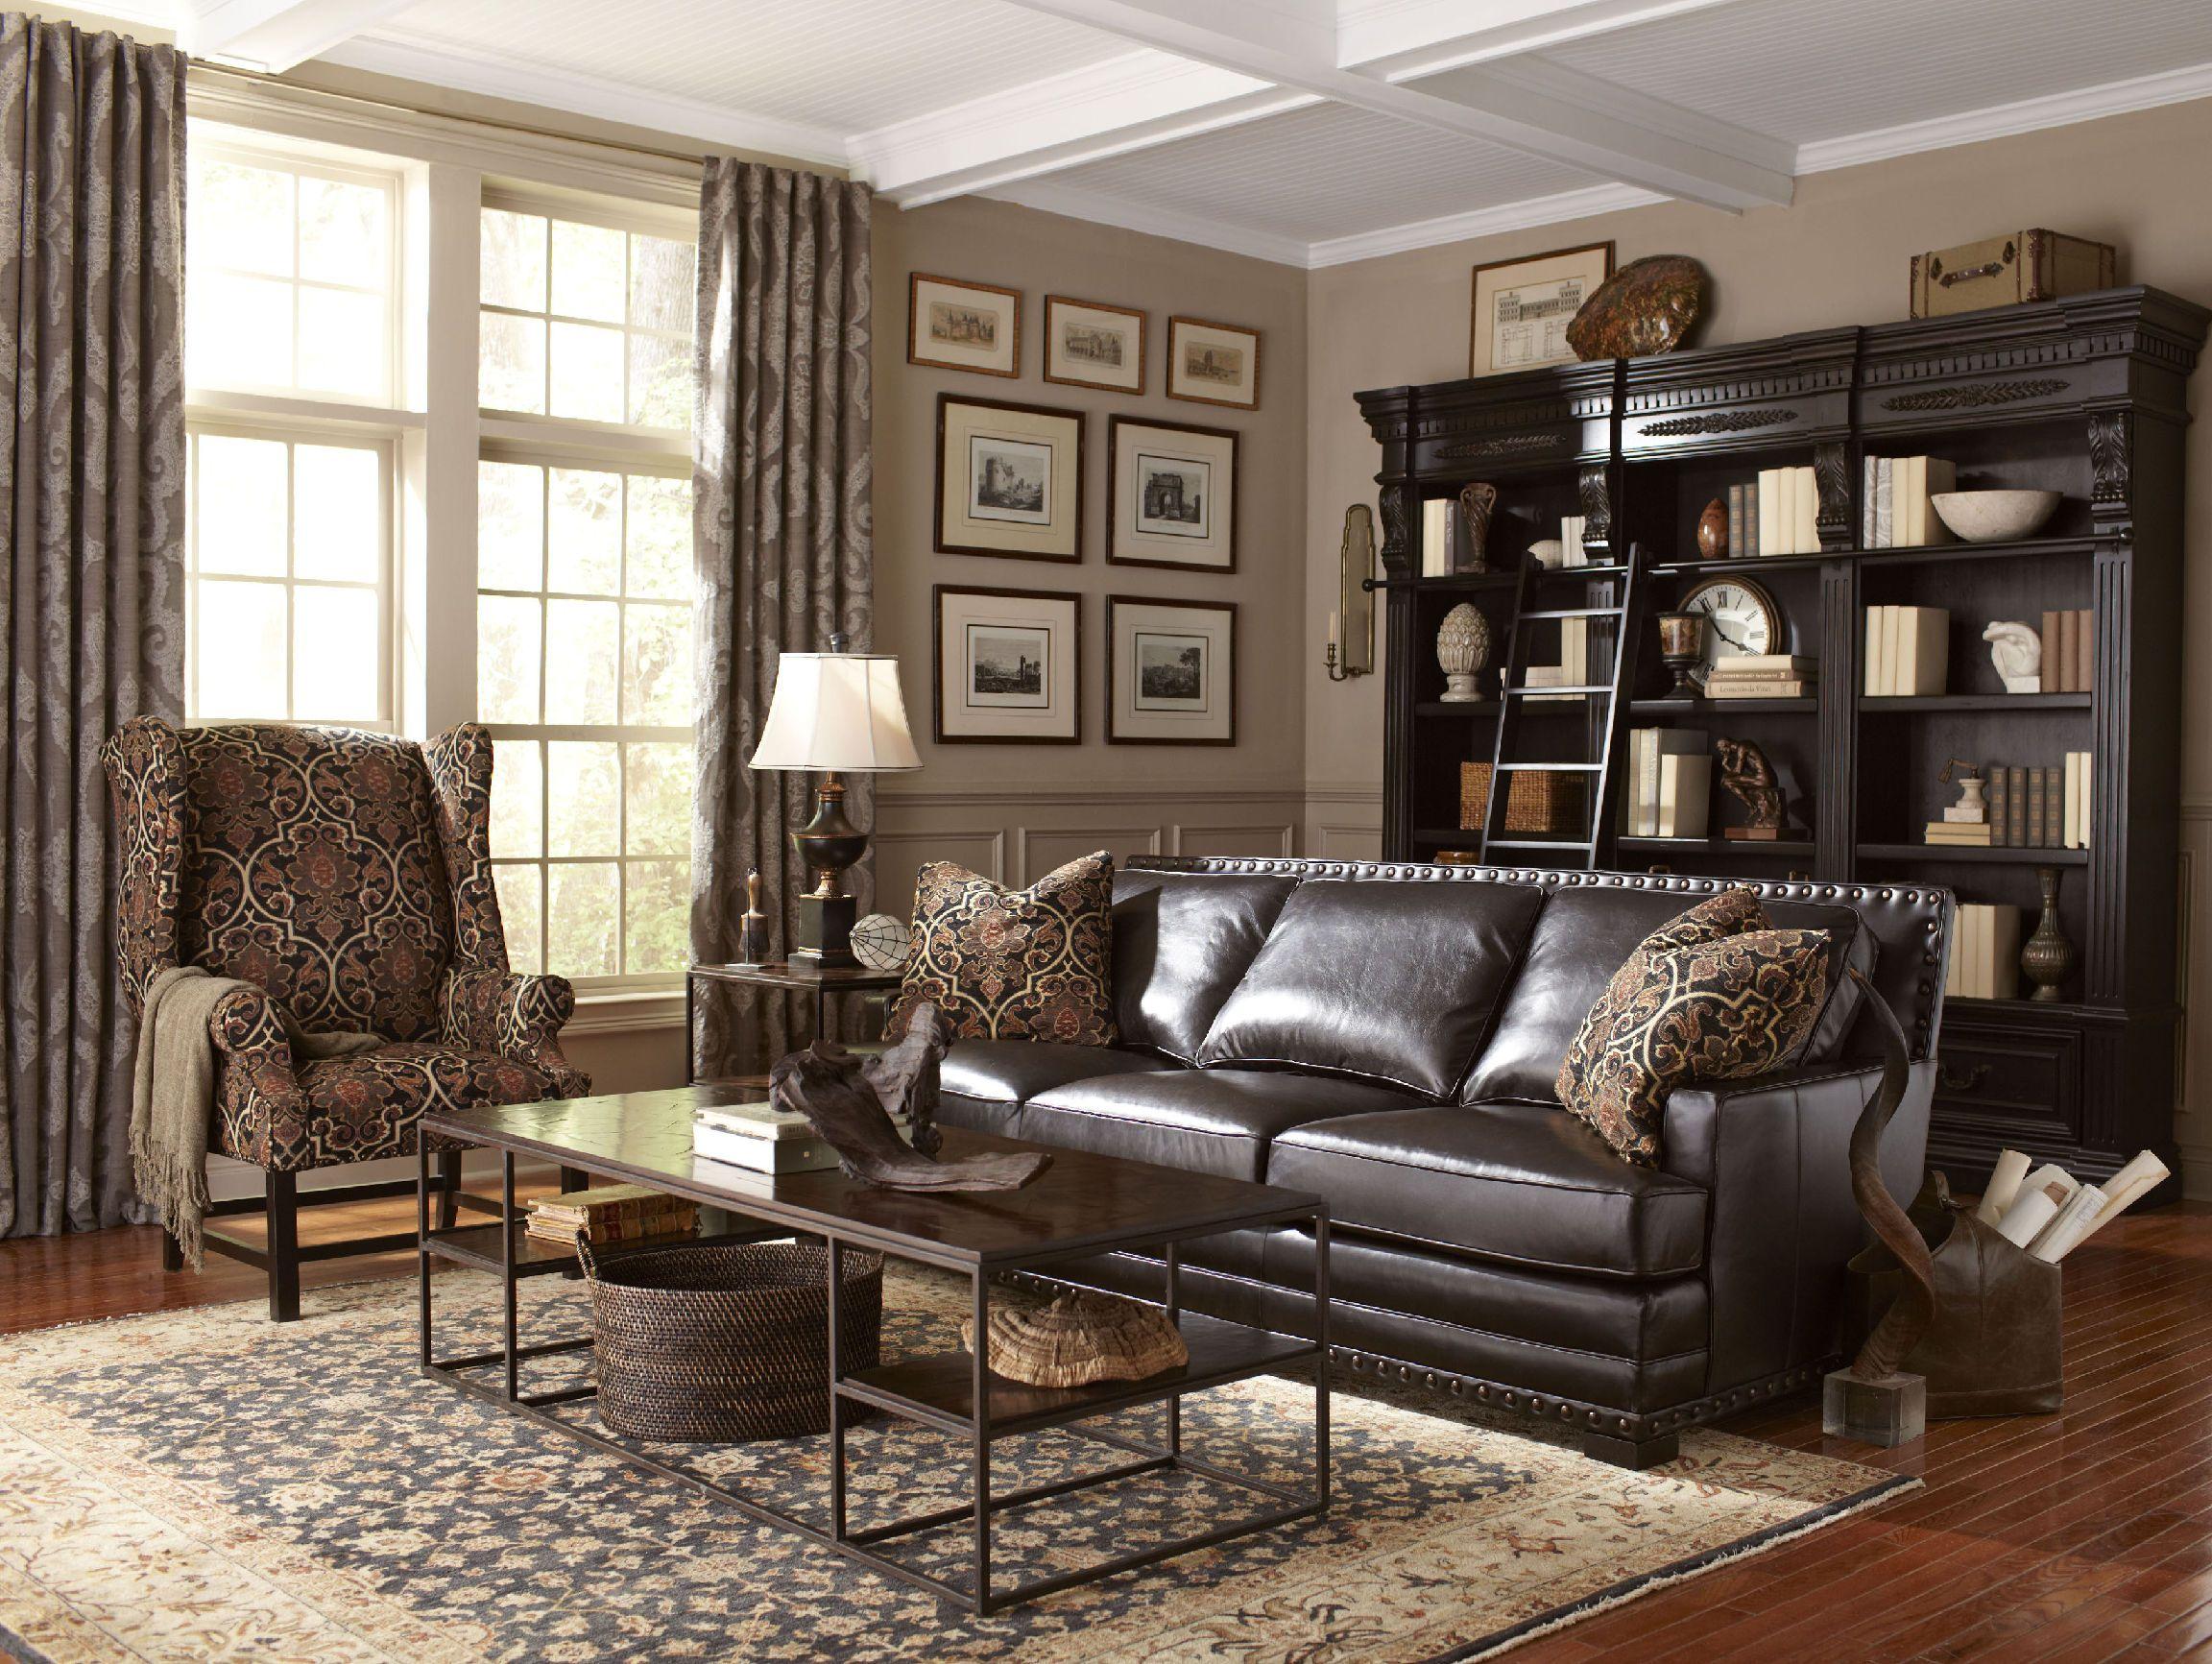 Bernhardt Fudge 100% top grain semi aniline leather sofa has